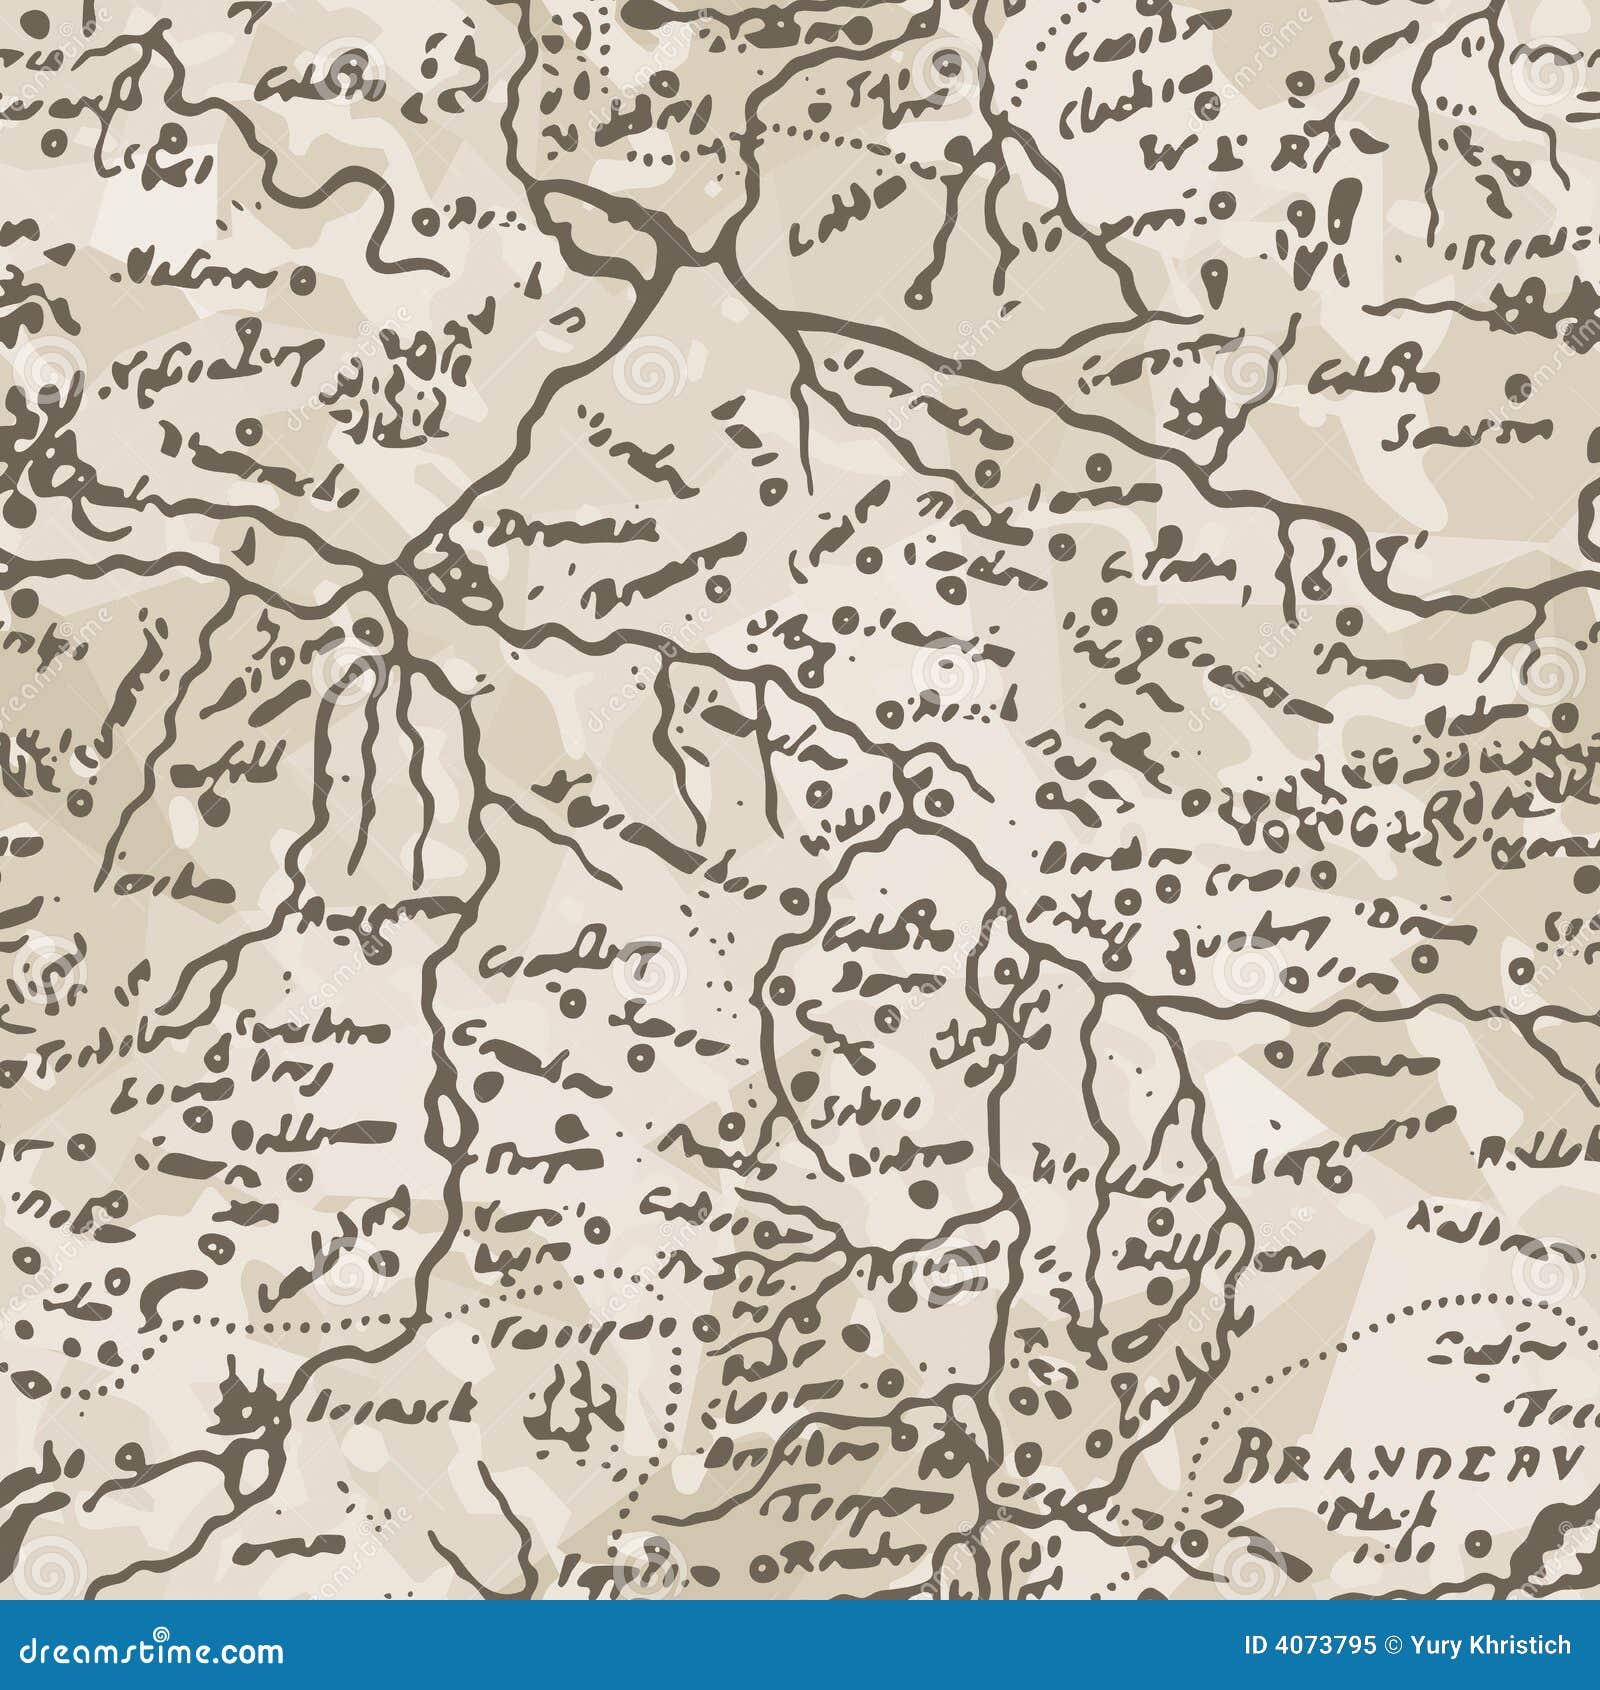 ancient global map royalty - photo #29